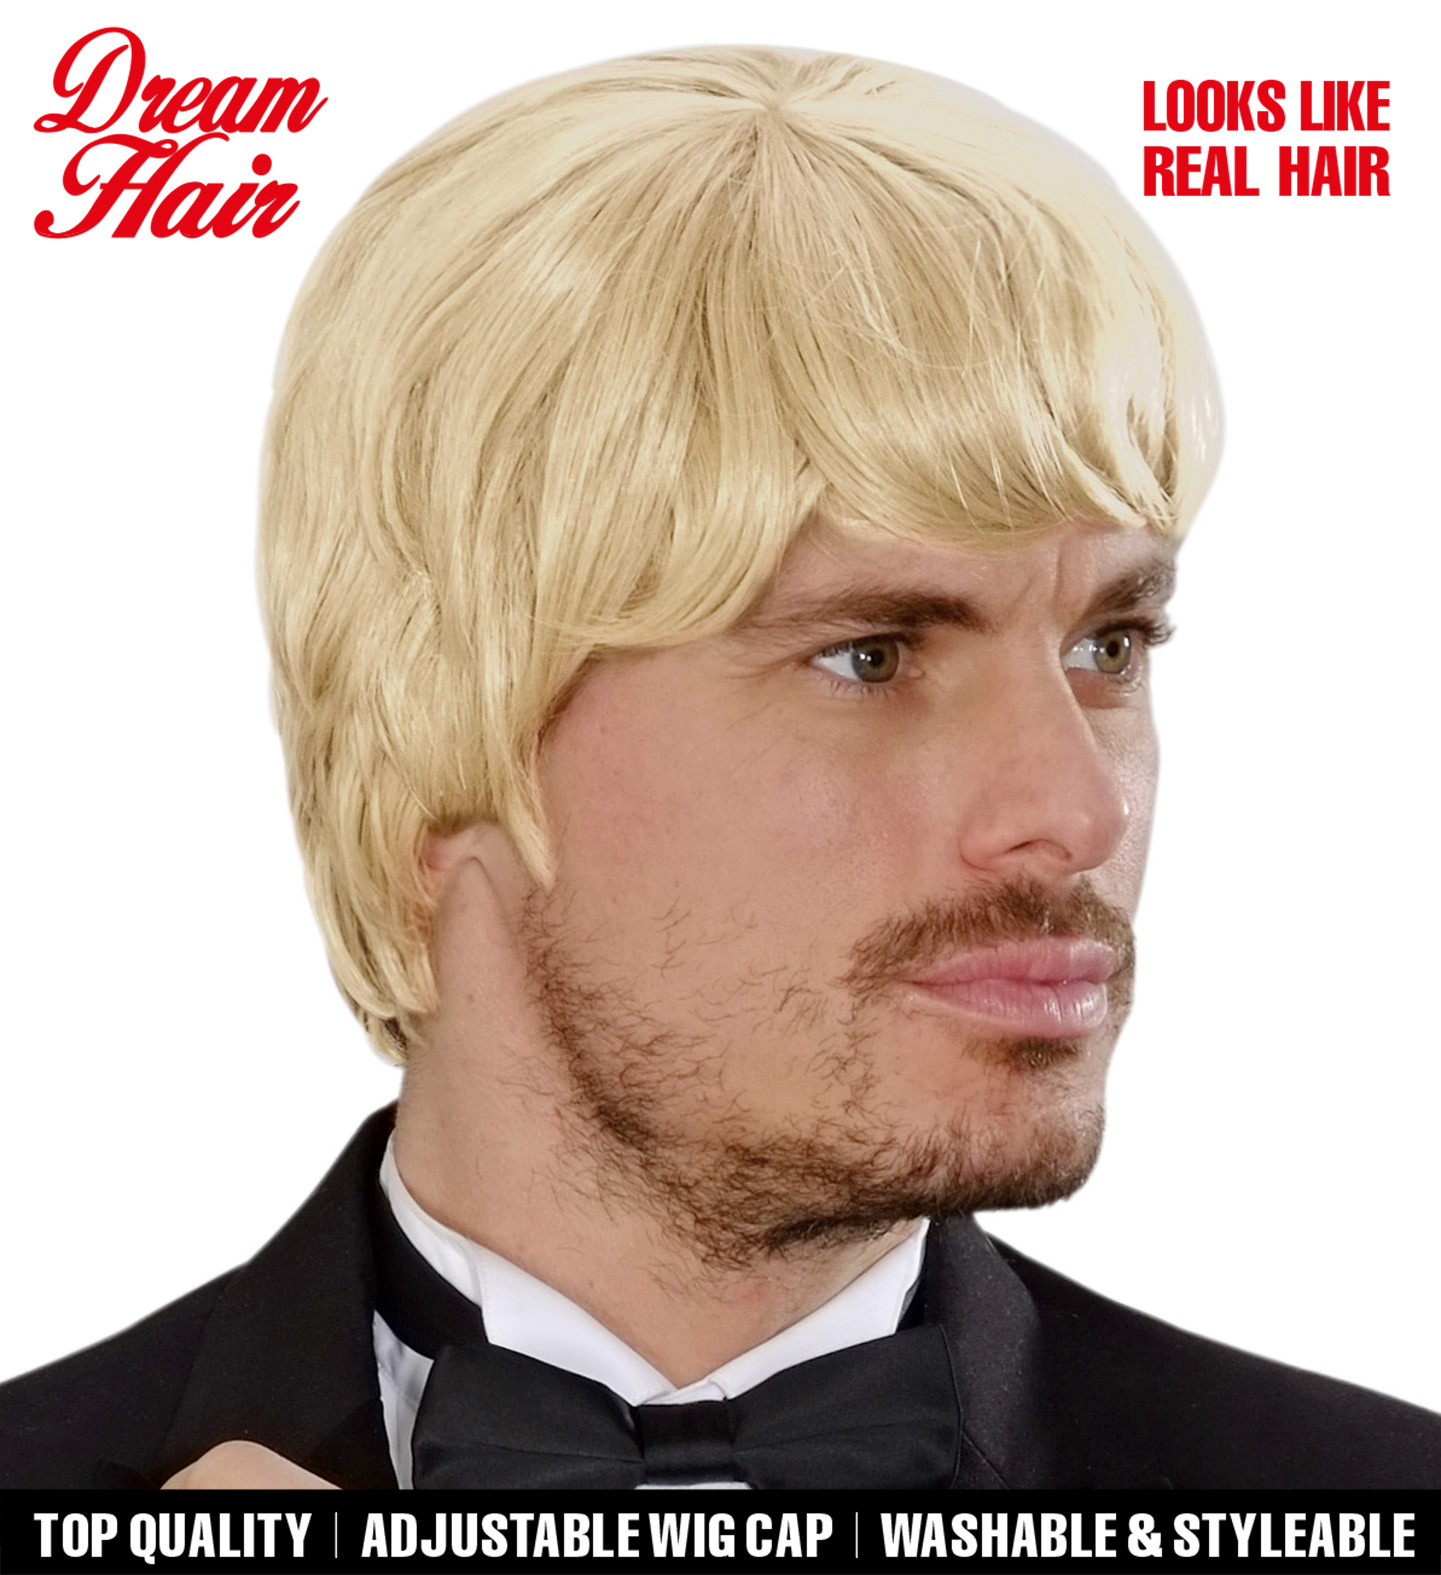 Blonde 60s Music Man Dreamhair Wig Fancy Dress